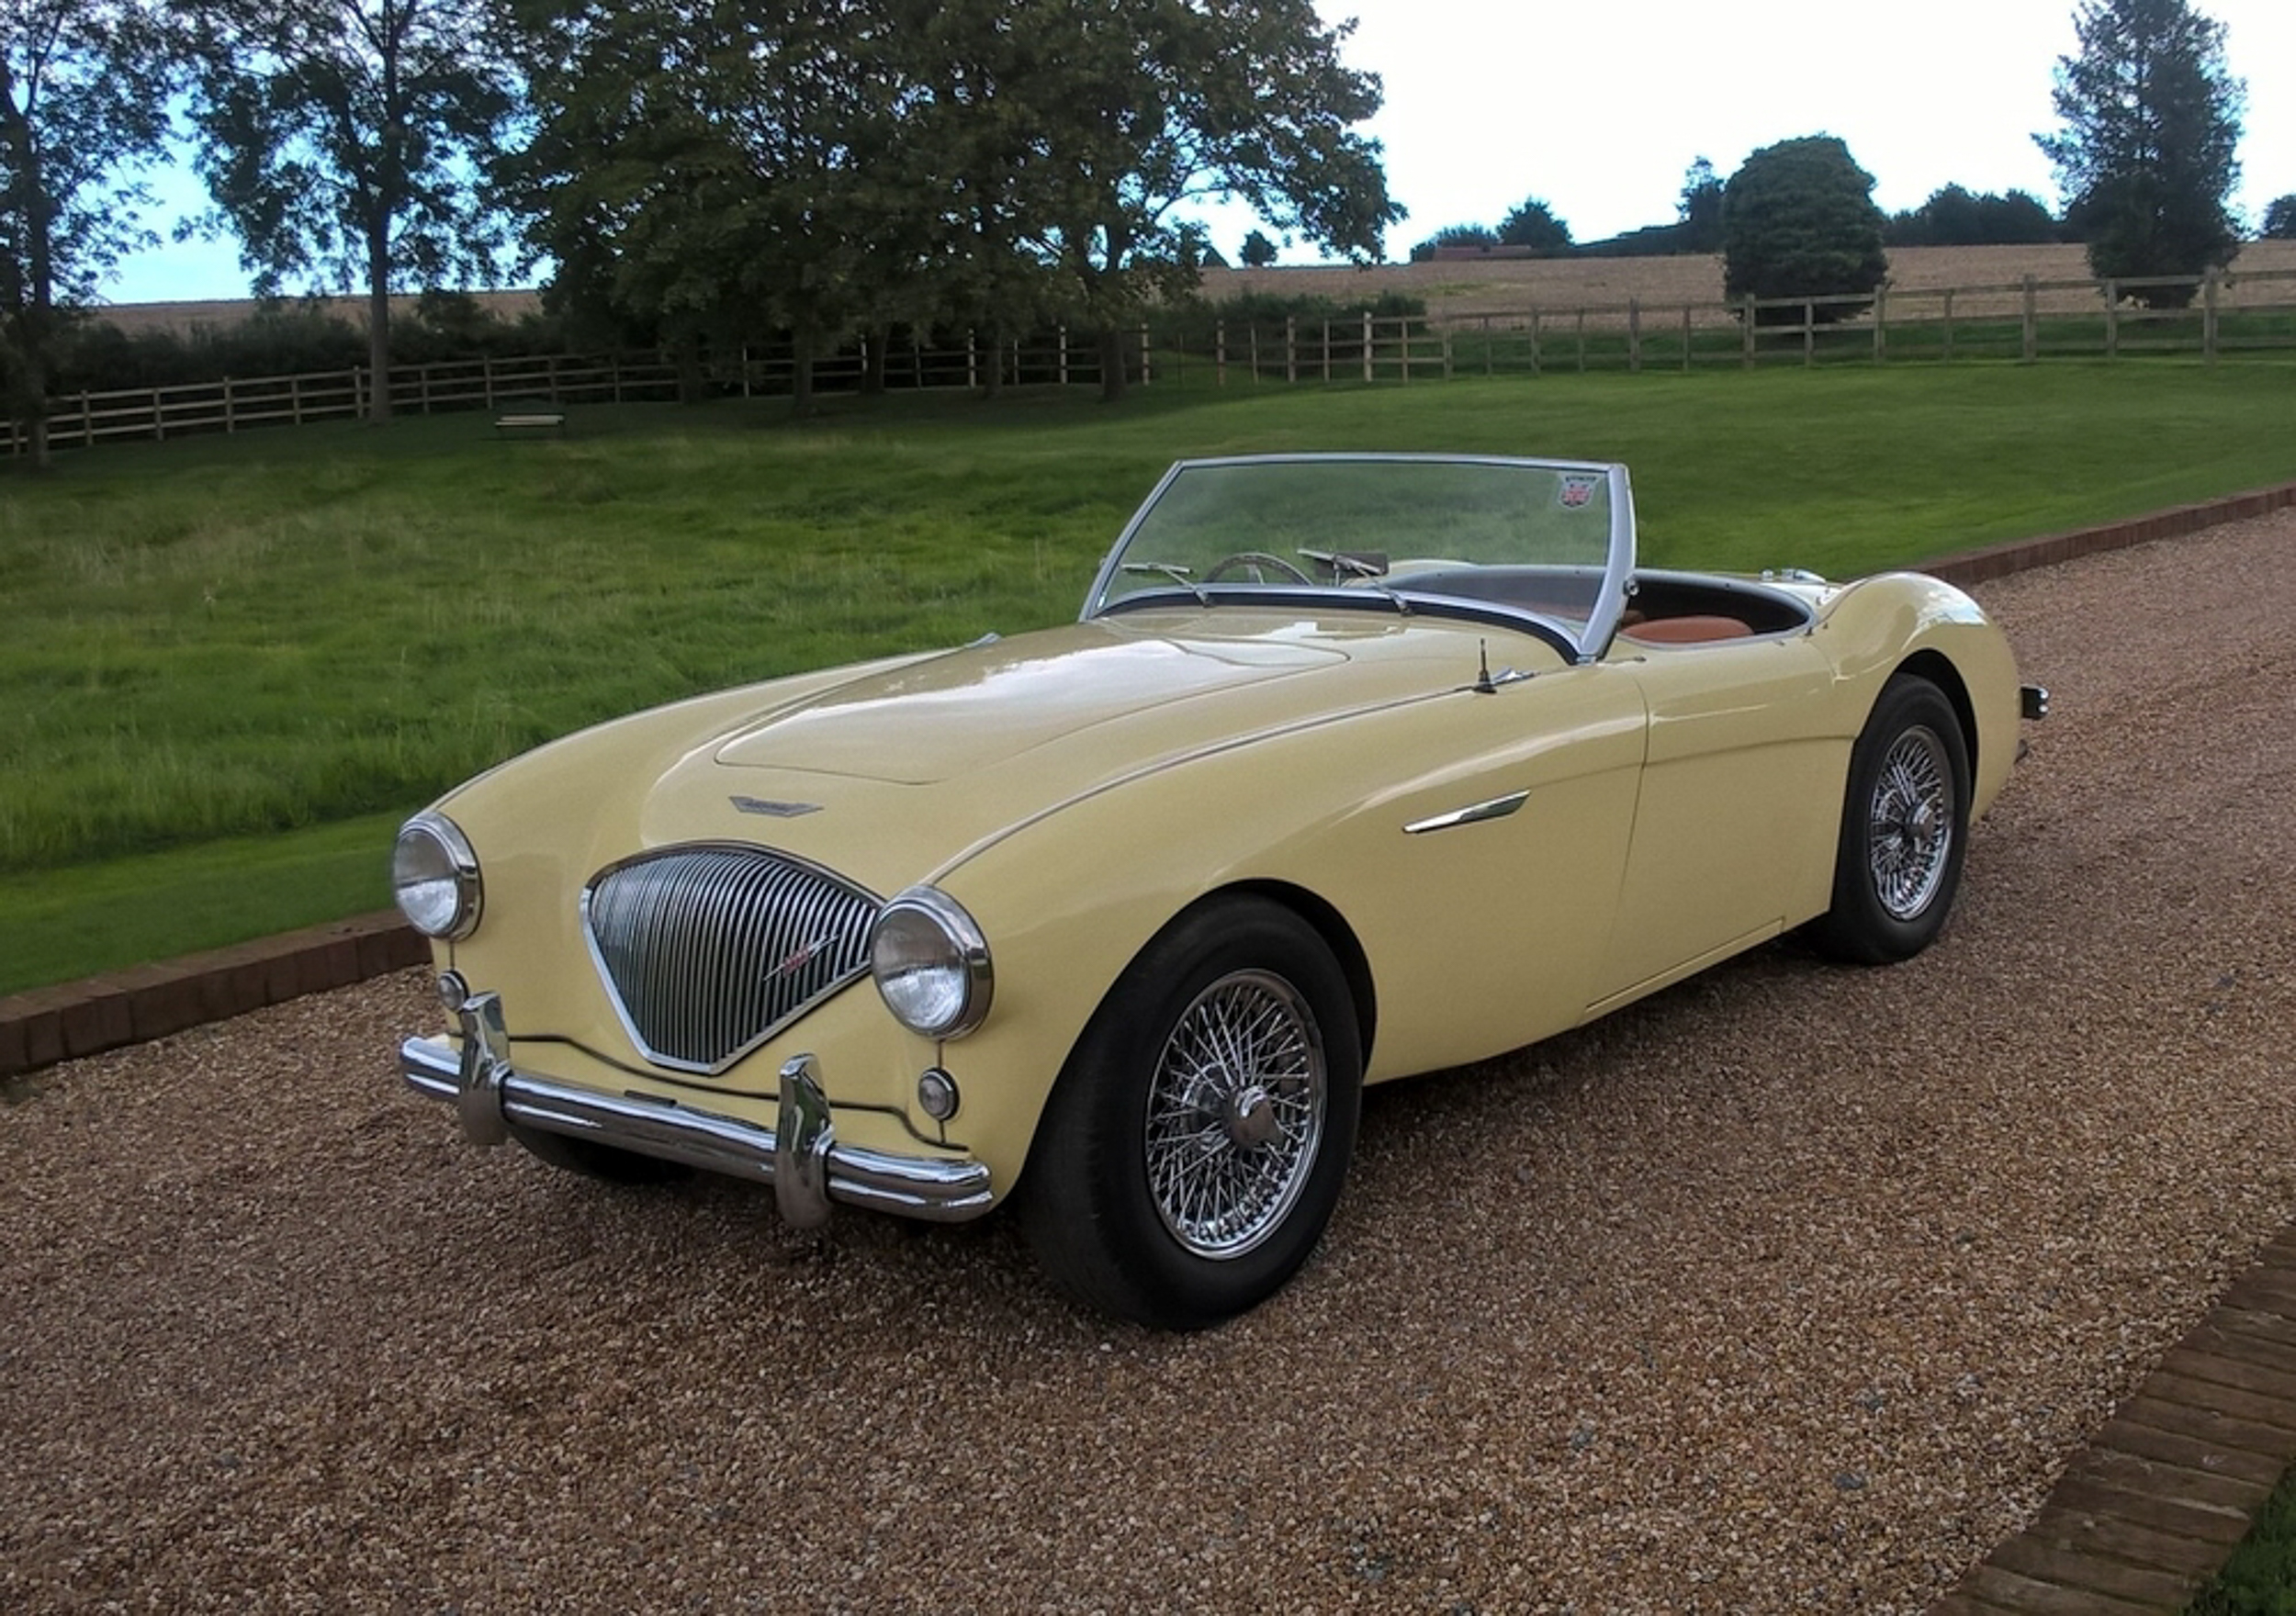 1955 Austin Healey 100/4 BN1